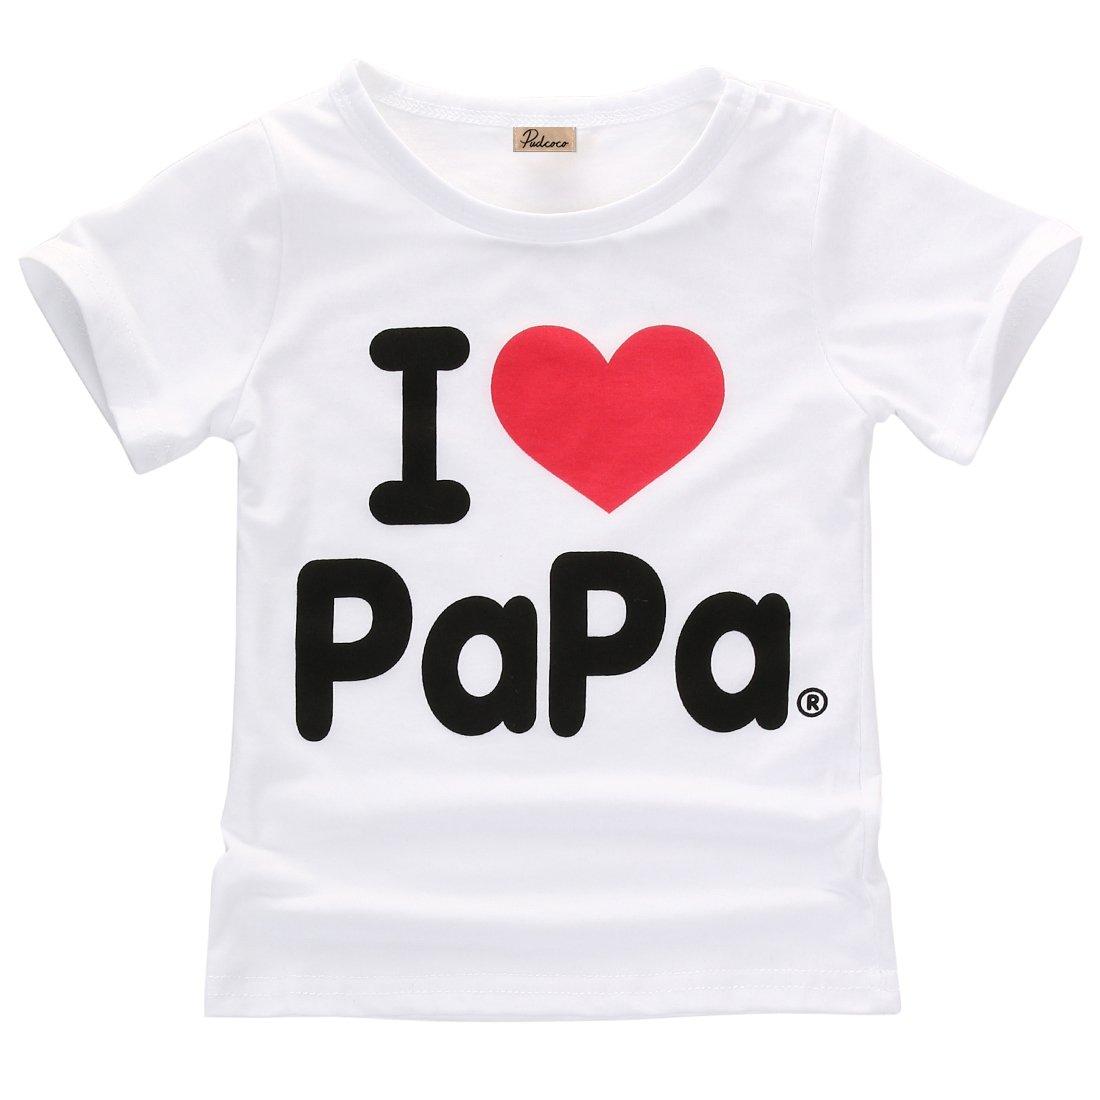 Baby Boy Girl T-Shirt+Shorts Matching Outfit Set